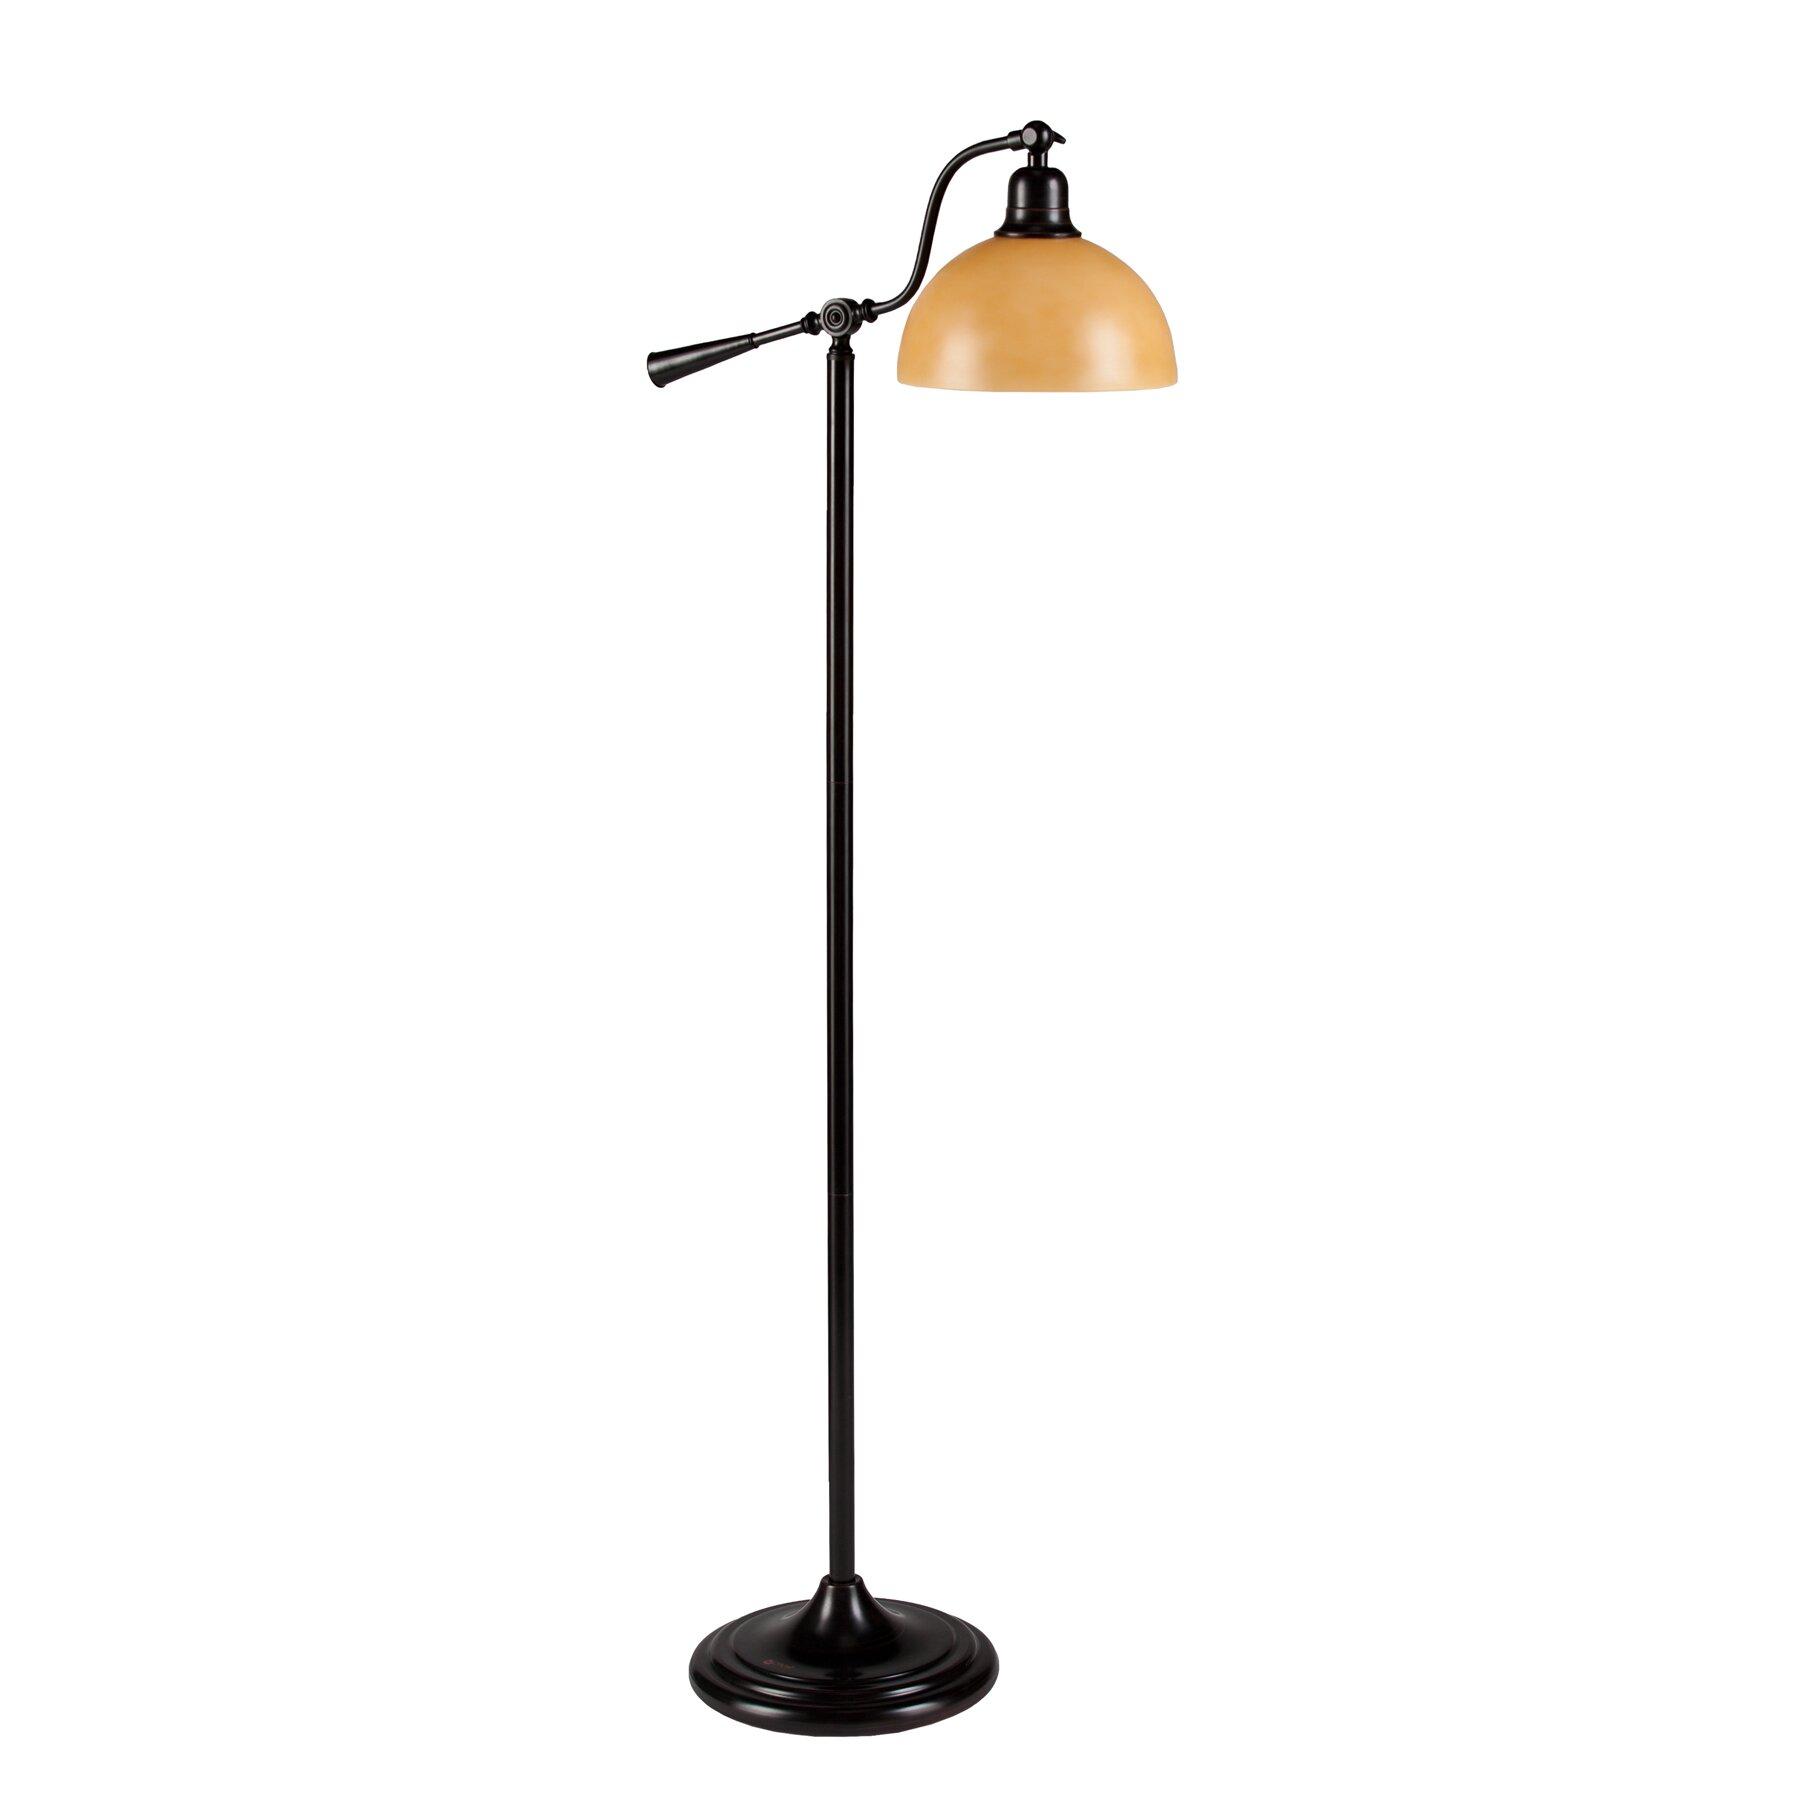 wildon home ottlite keeton task floor lamp reviews. Black Bedroom Furniture Sets. Home Design Ideas